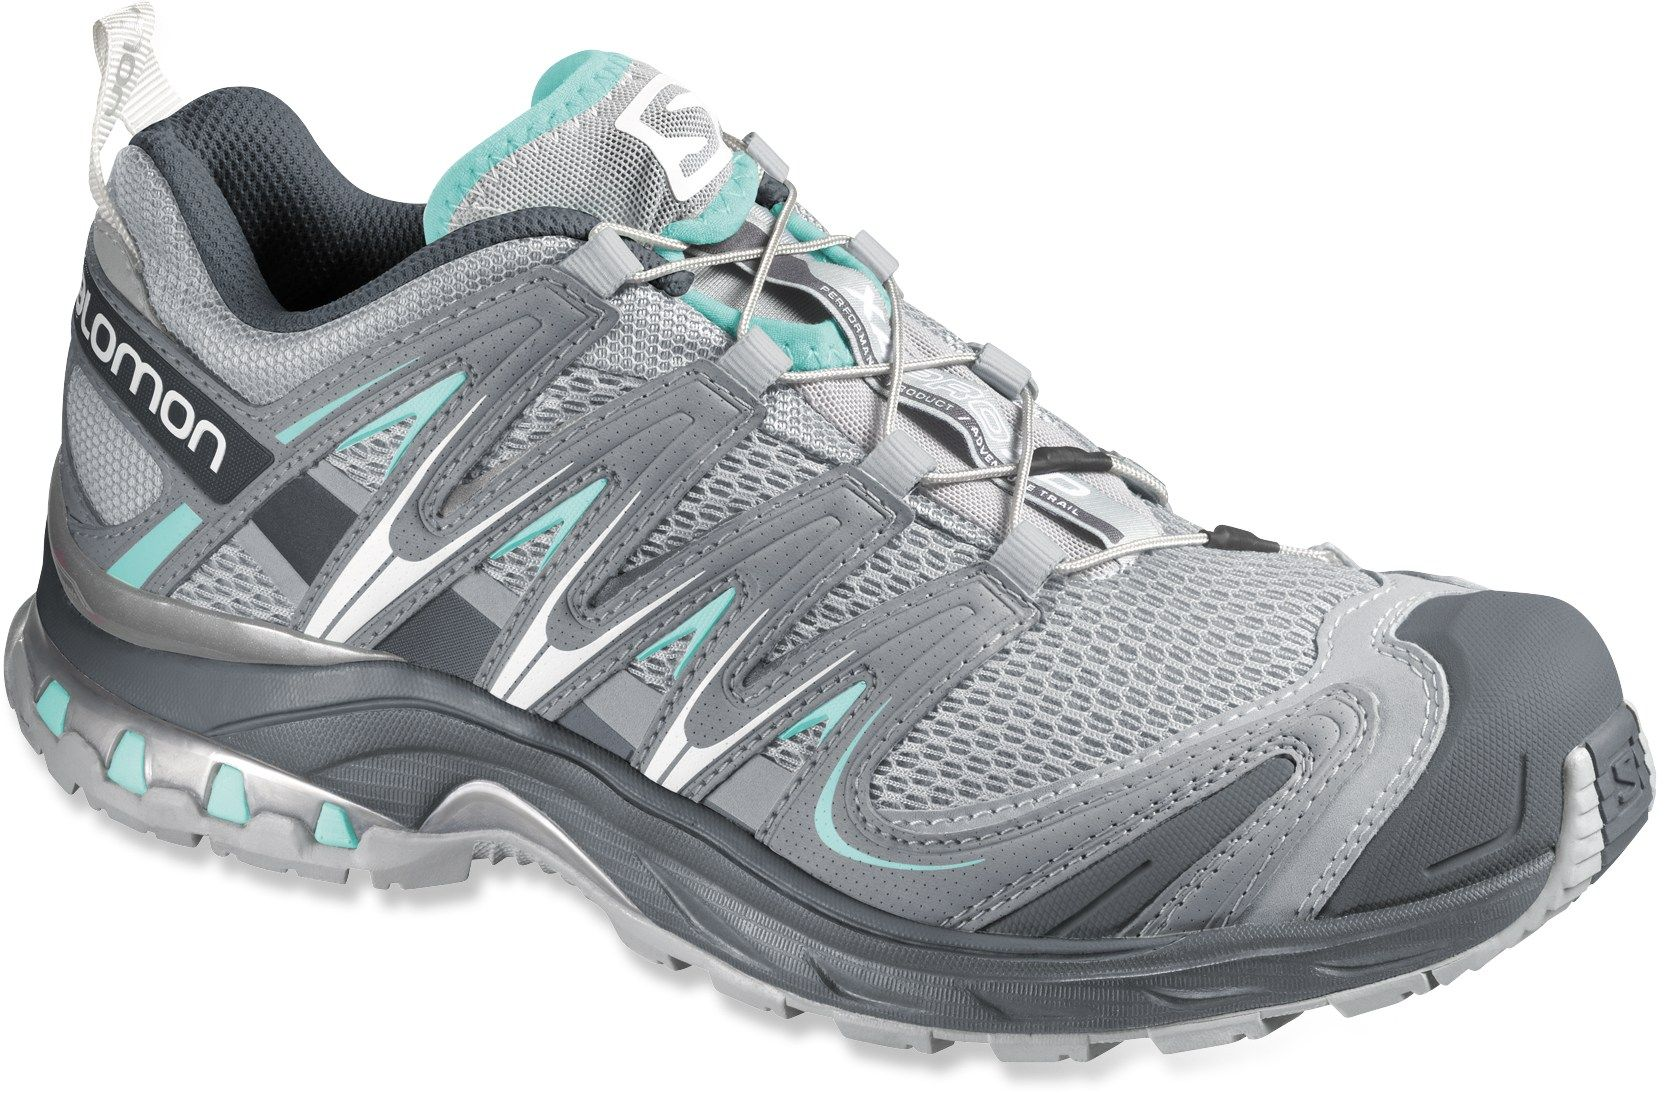 Salomon XA Pro 3D Trail Running Shoes Women's | Trail